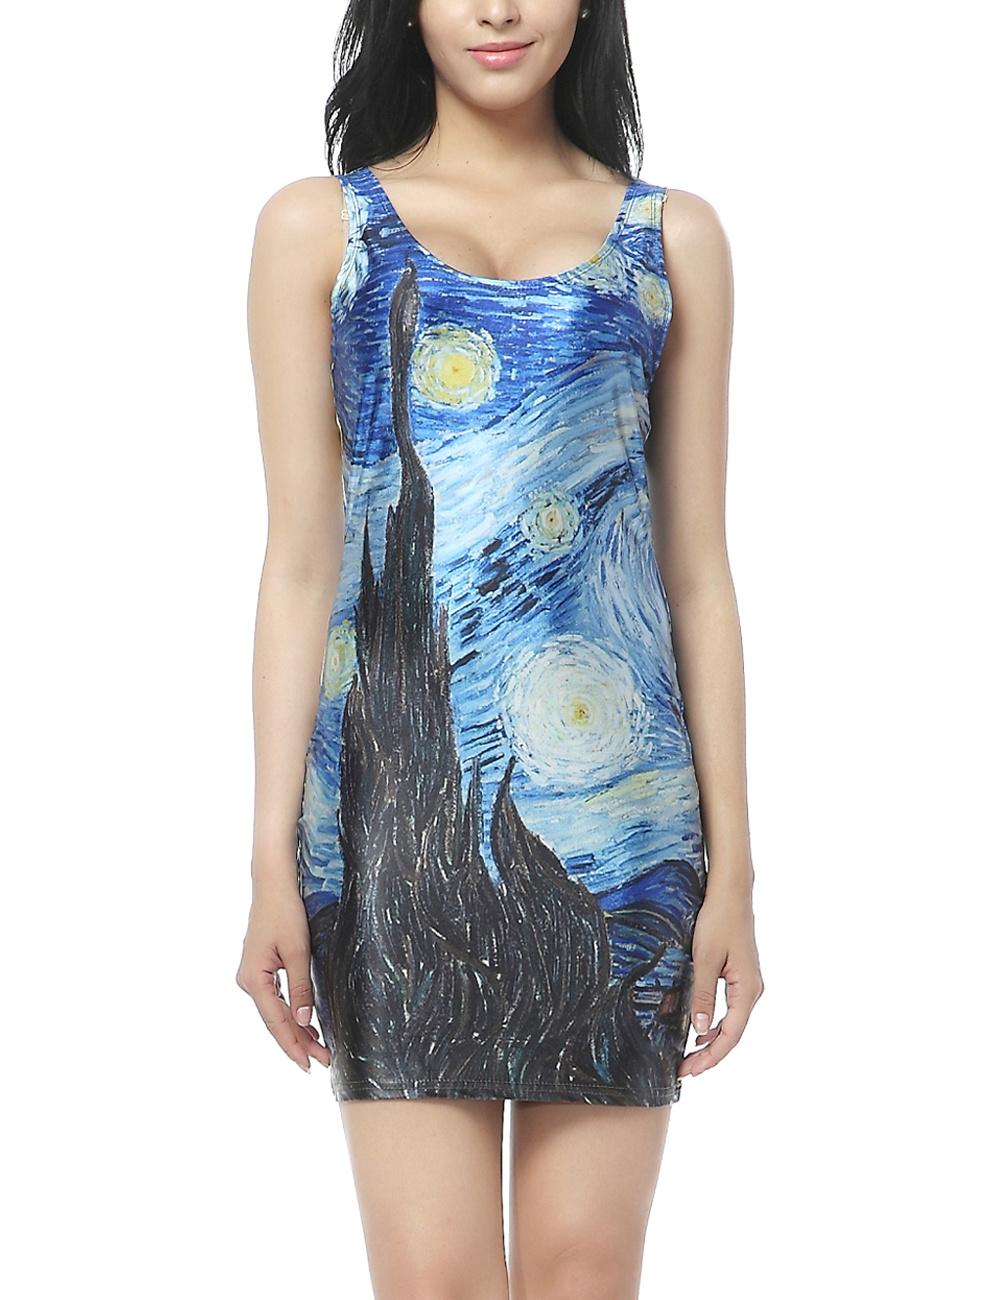 ... Slimming Bodycon Stretch Vest Short Dress Pencil Dress - PrettyGuide